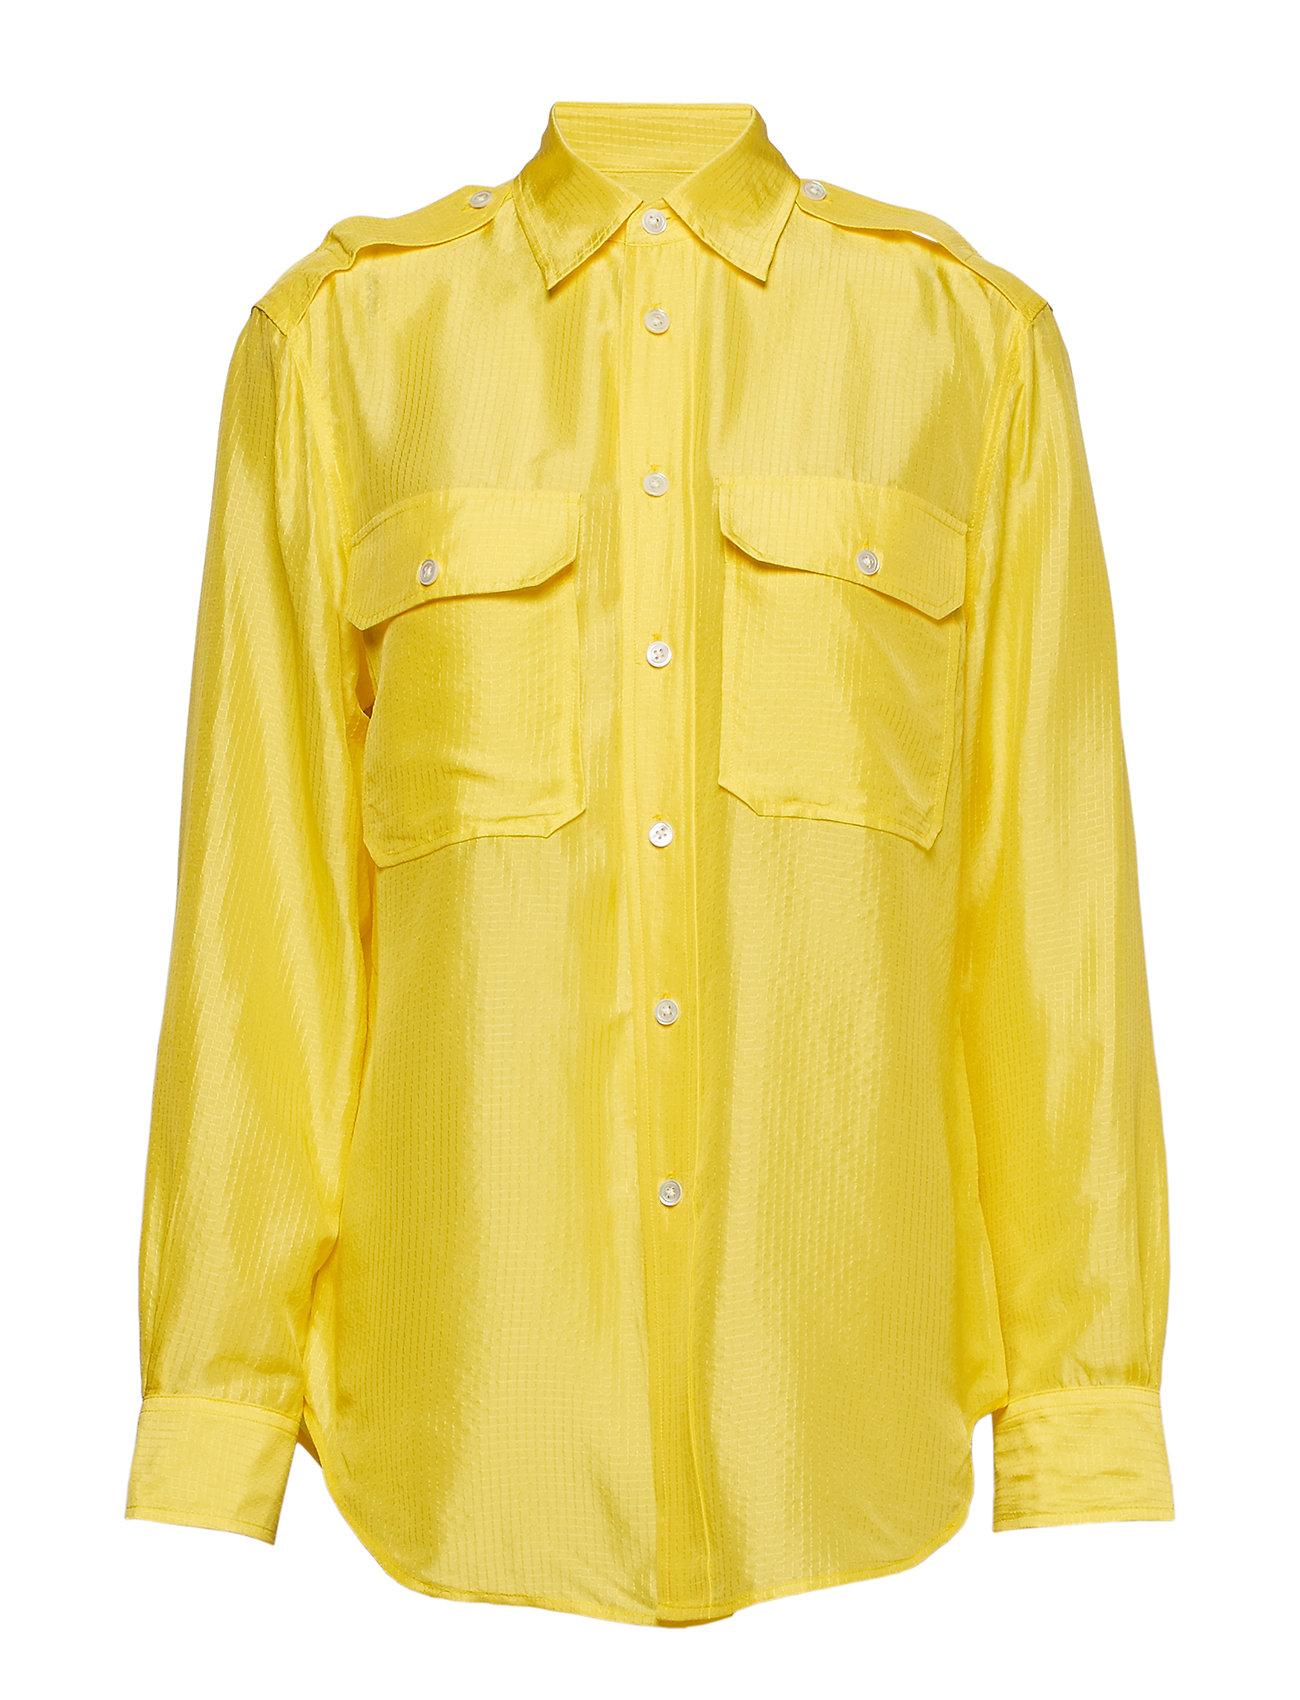 Polo Ralph Lauren Silk Military Shirt - OPTIC YELLOW